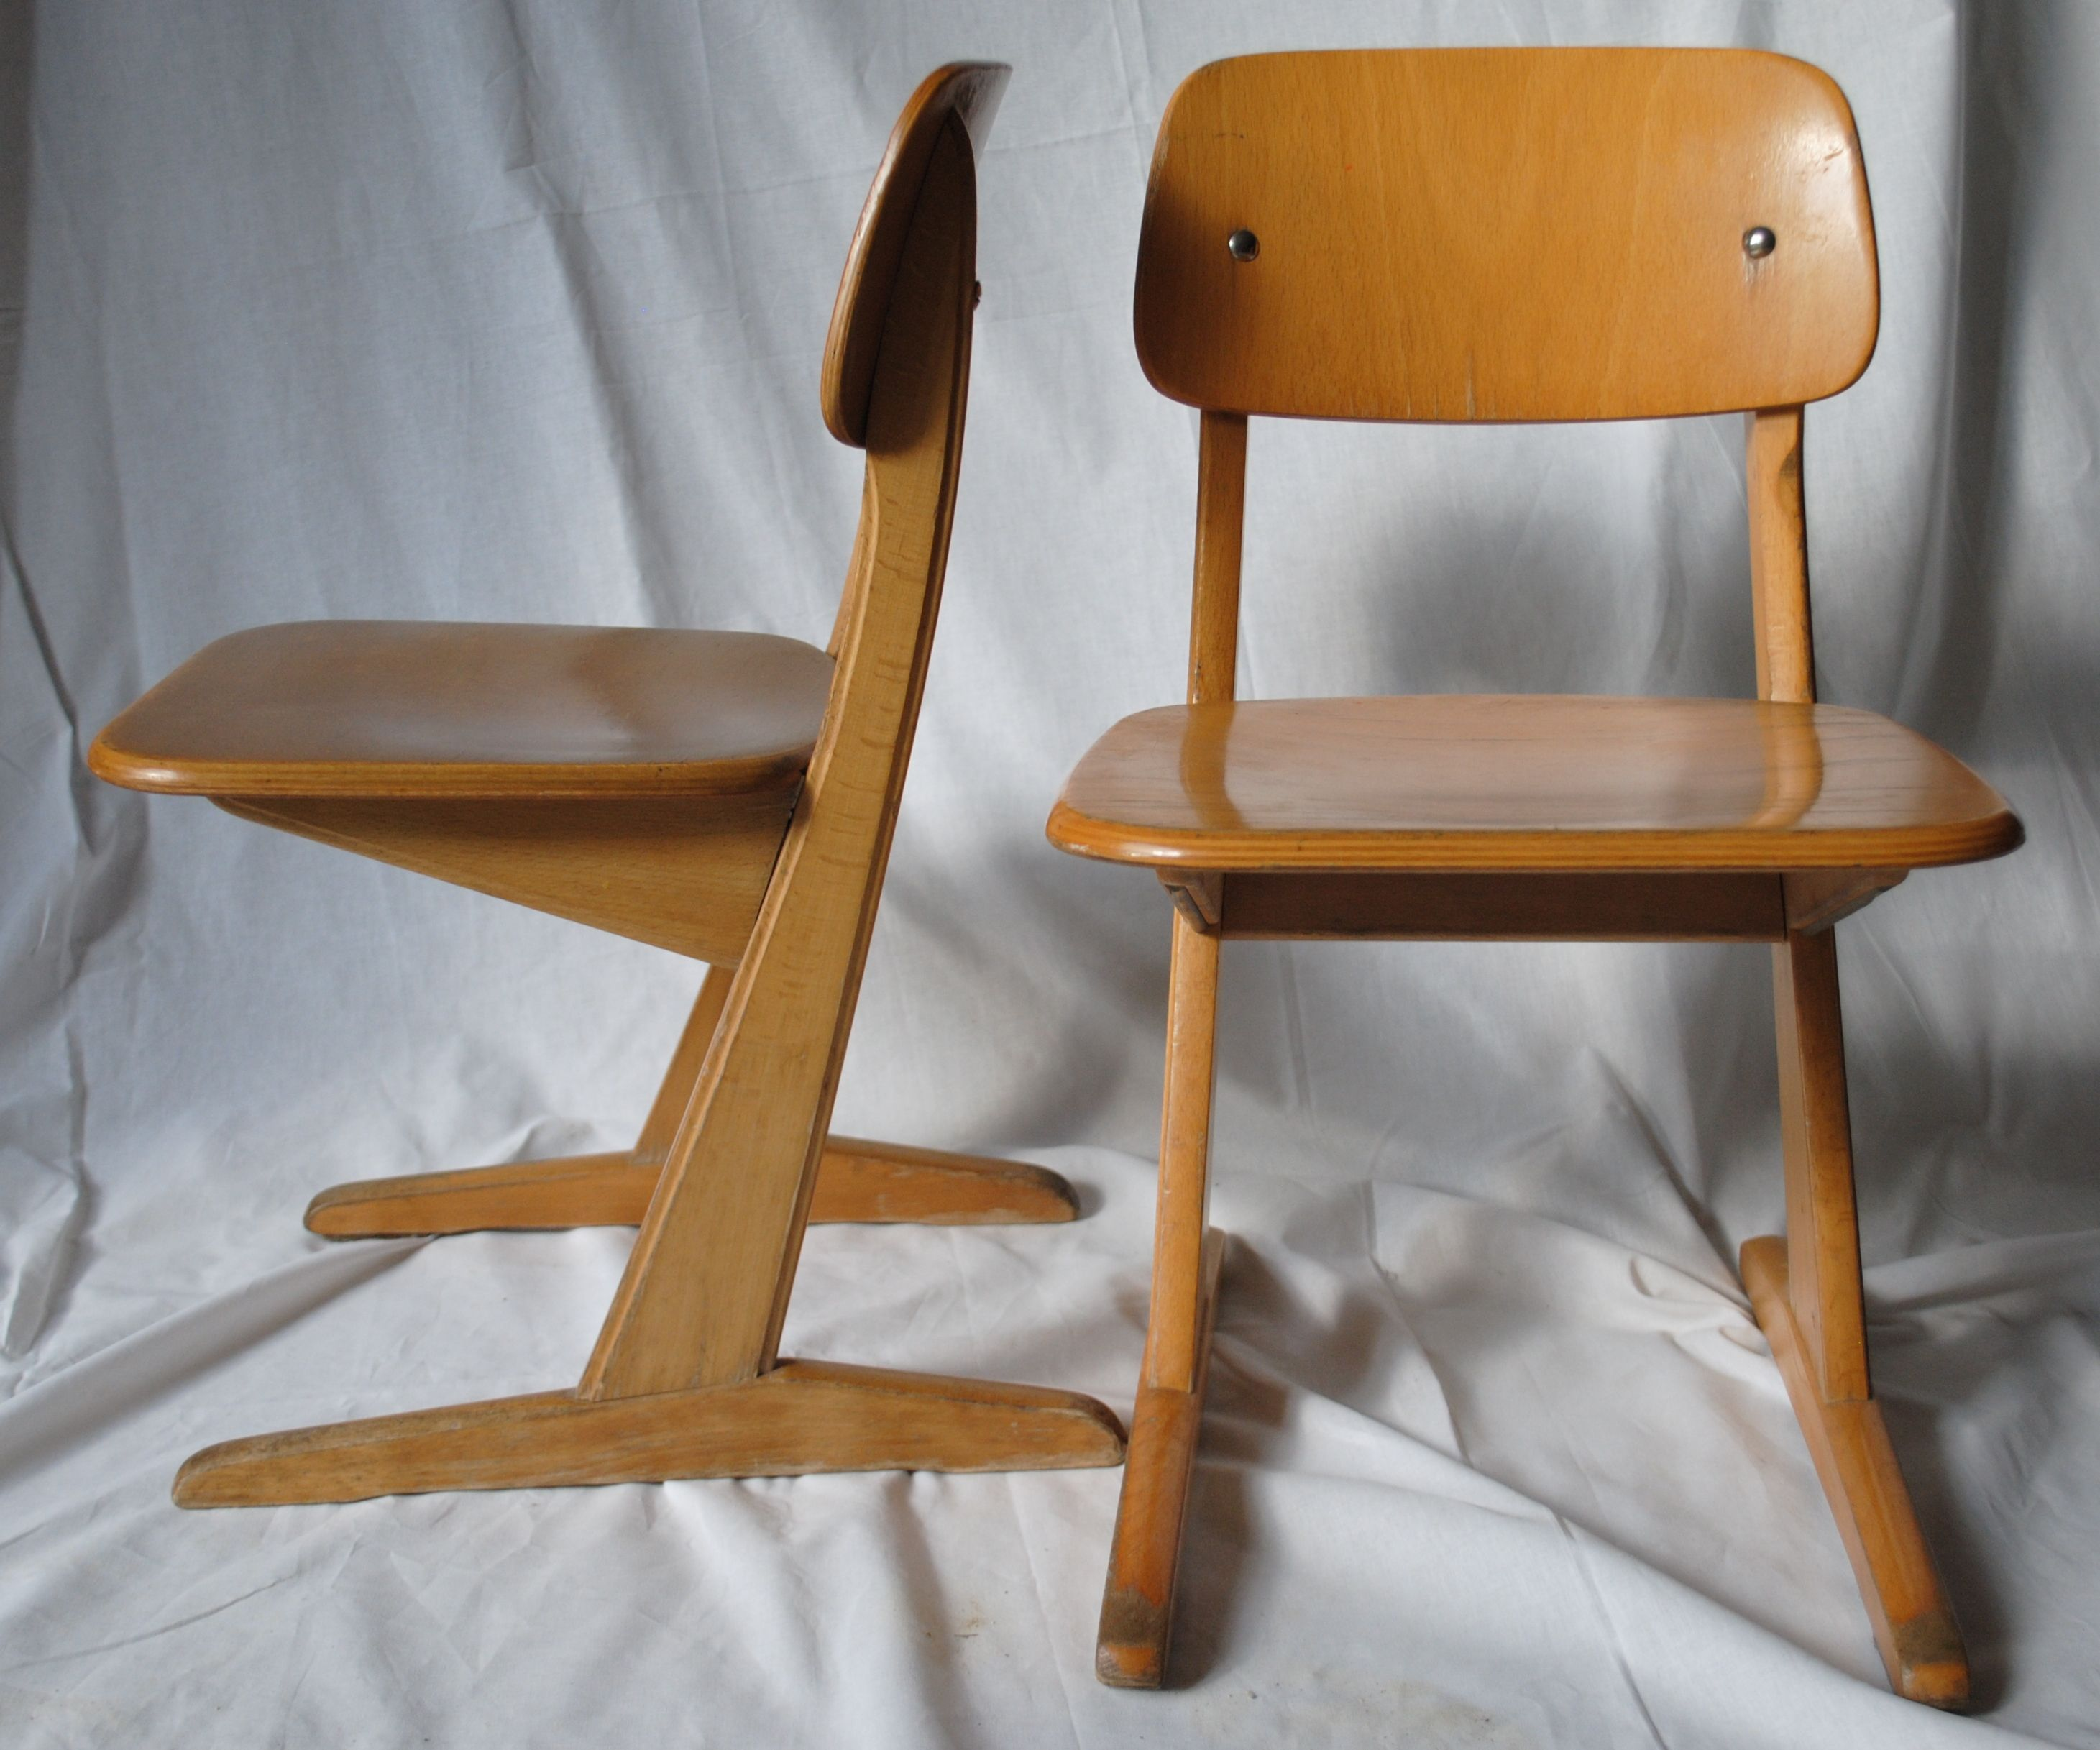 Baumann chaise chair chaises fauteuils pinterest baumann